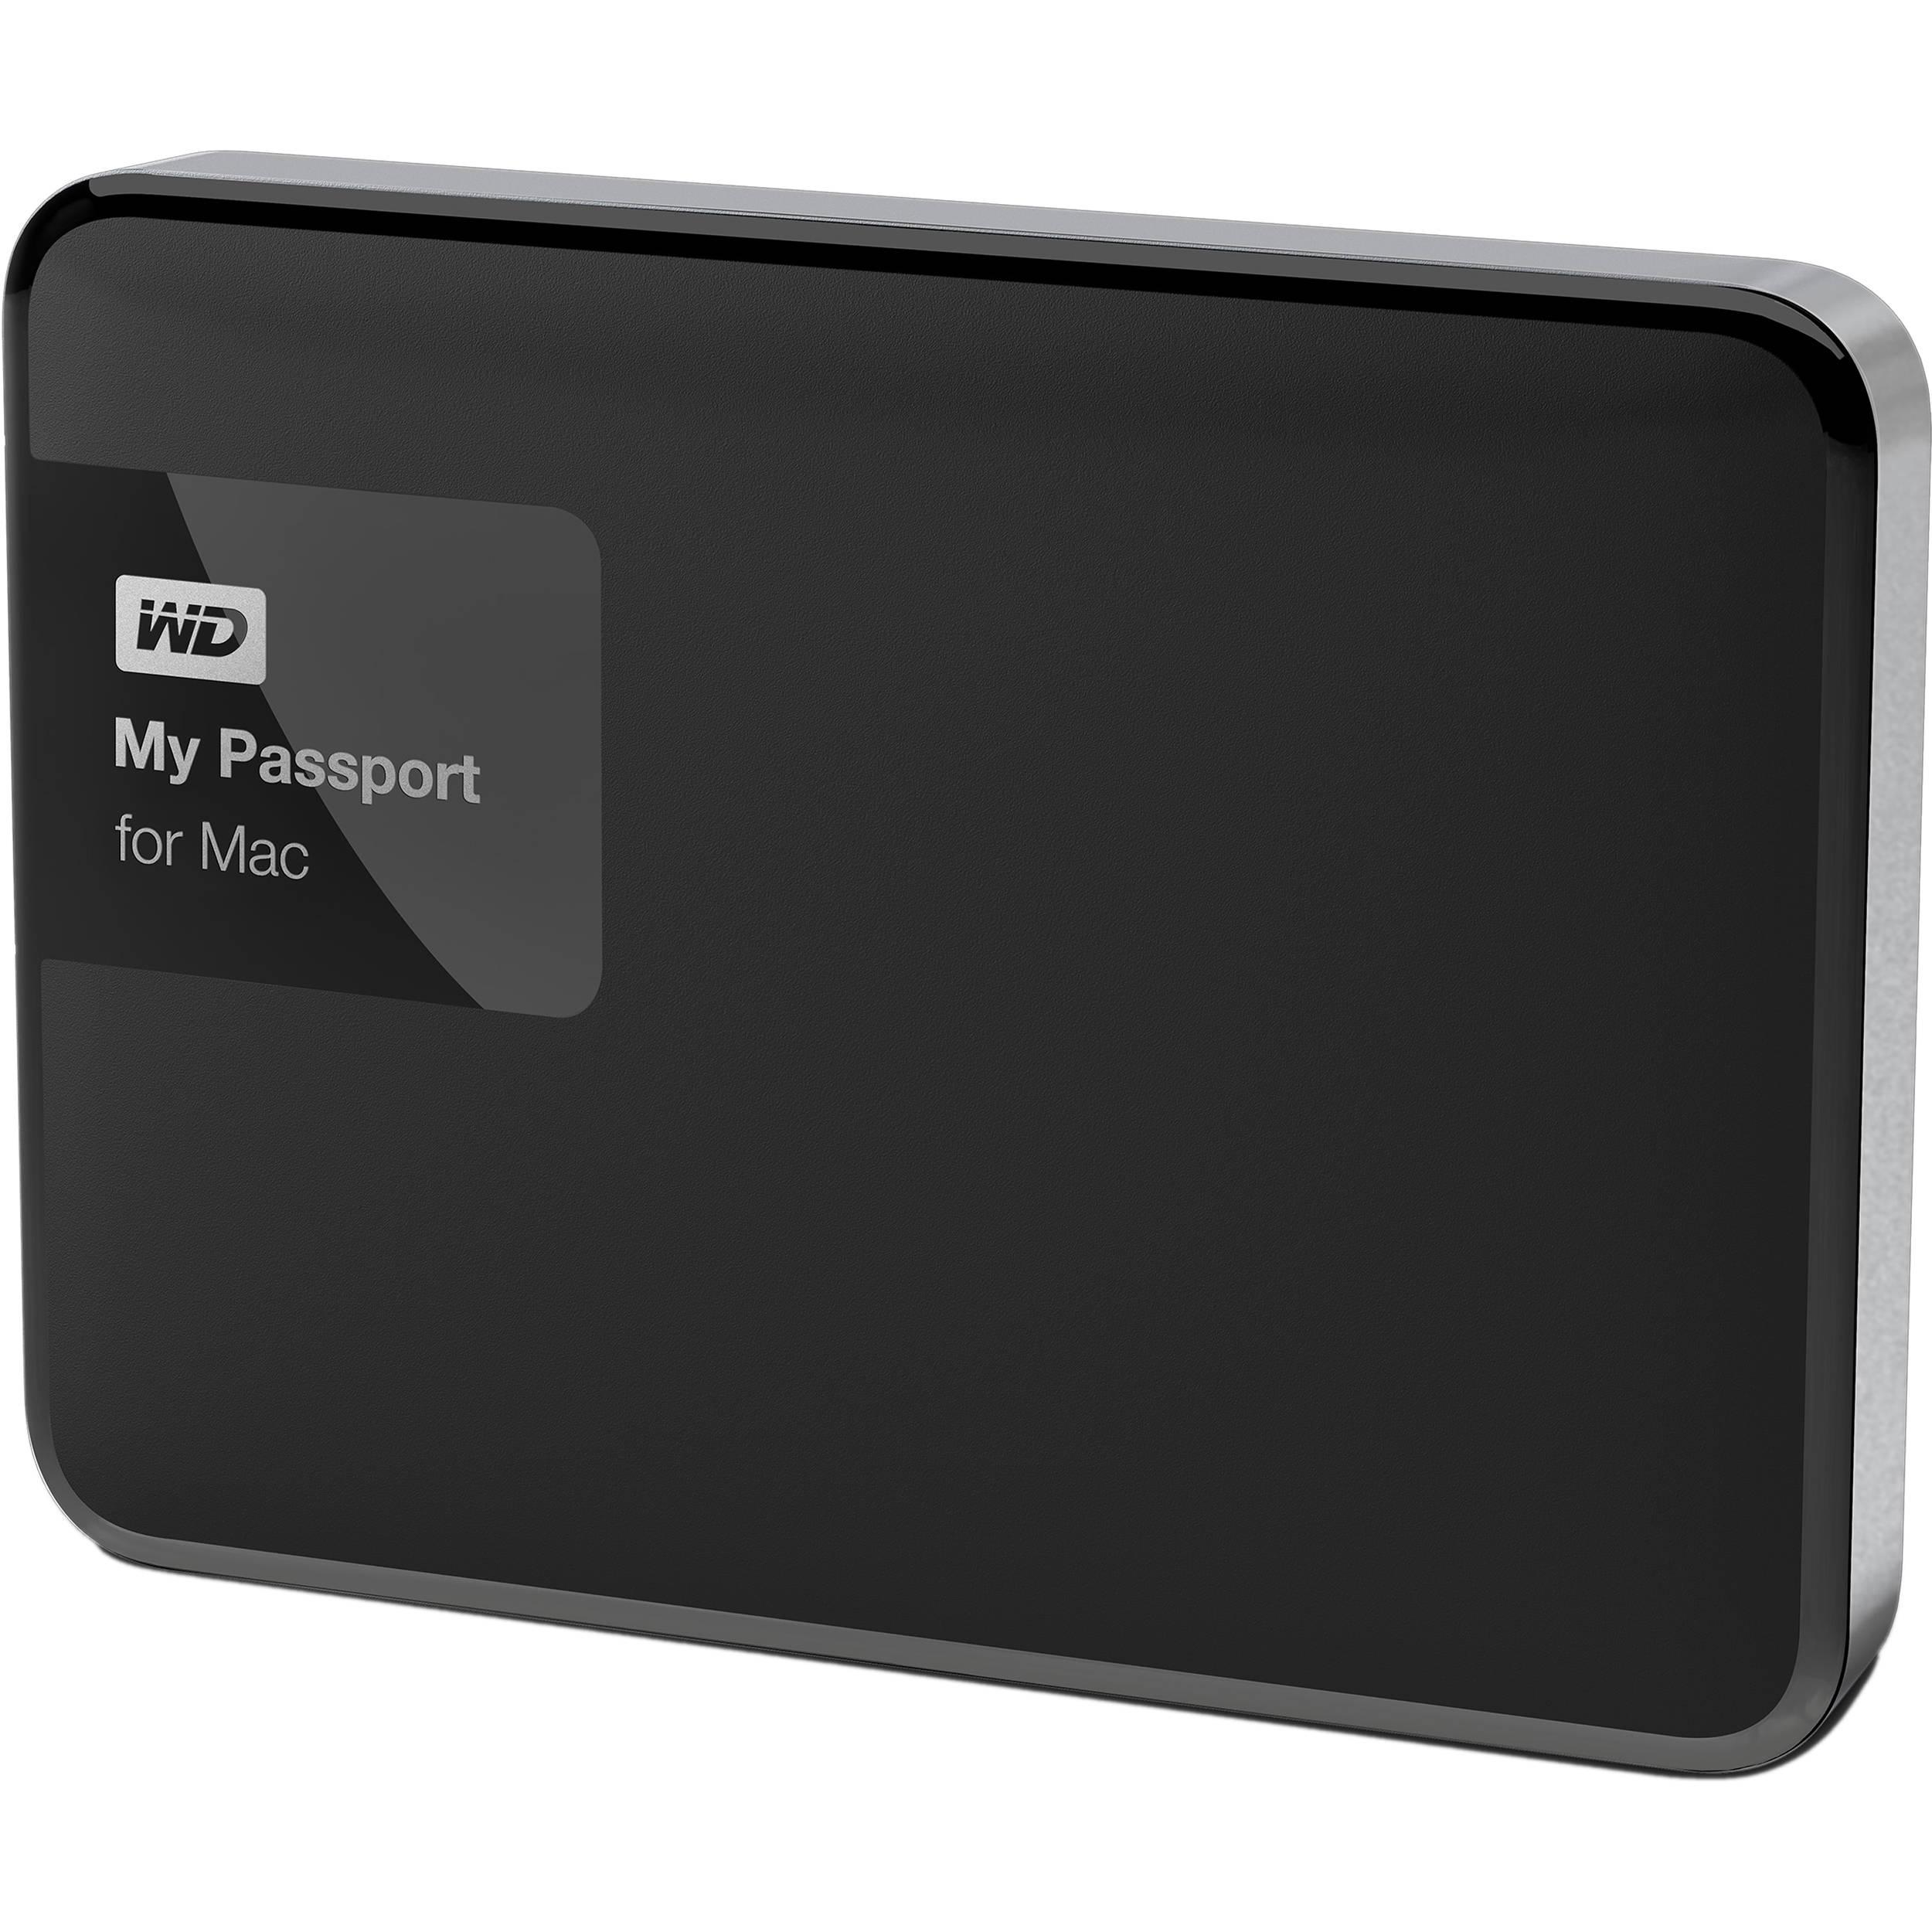 WD 1TB My Passport USB 3.0 Portable Hard Drive